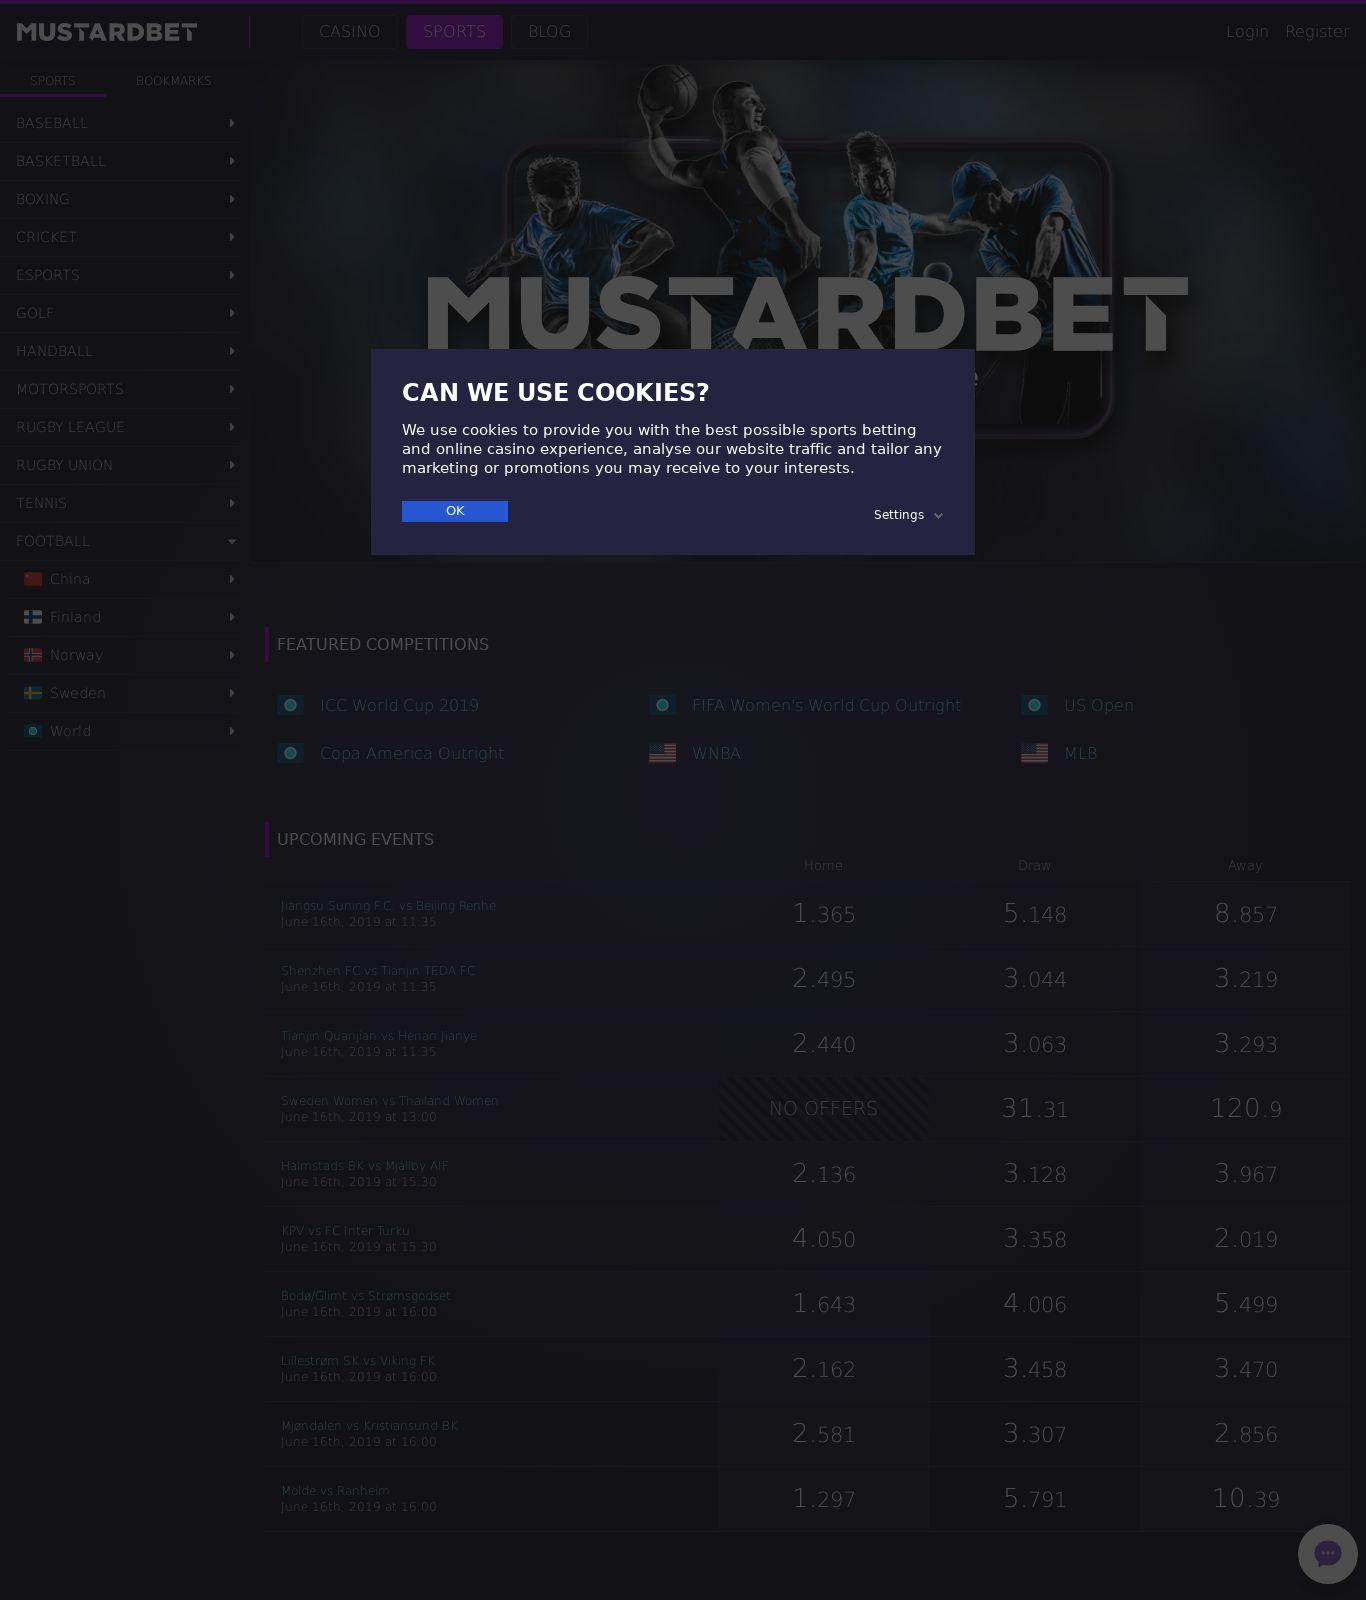 MUSTARDBET COM   Mustard Bet Casino Scam or not? - Review